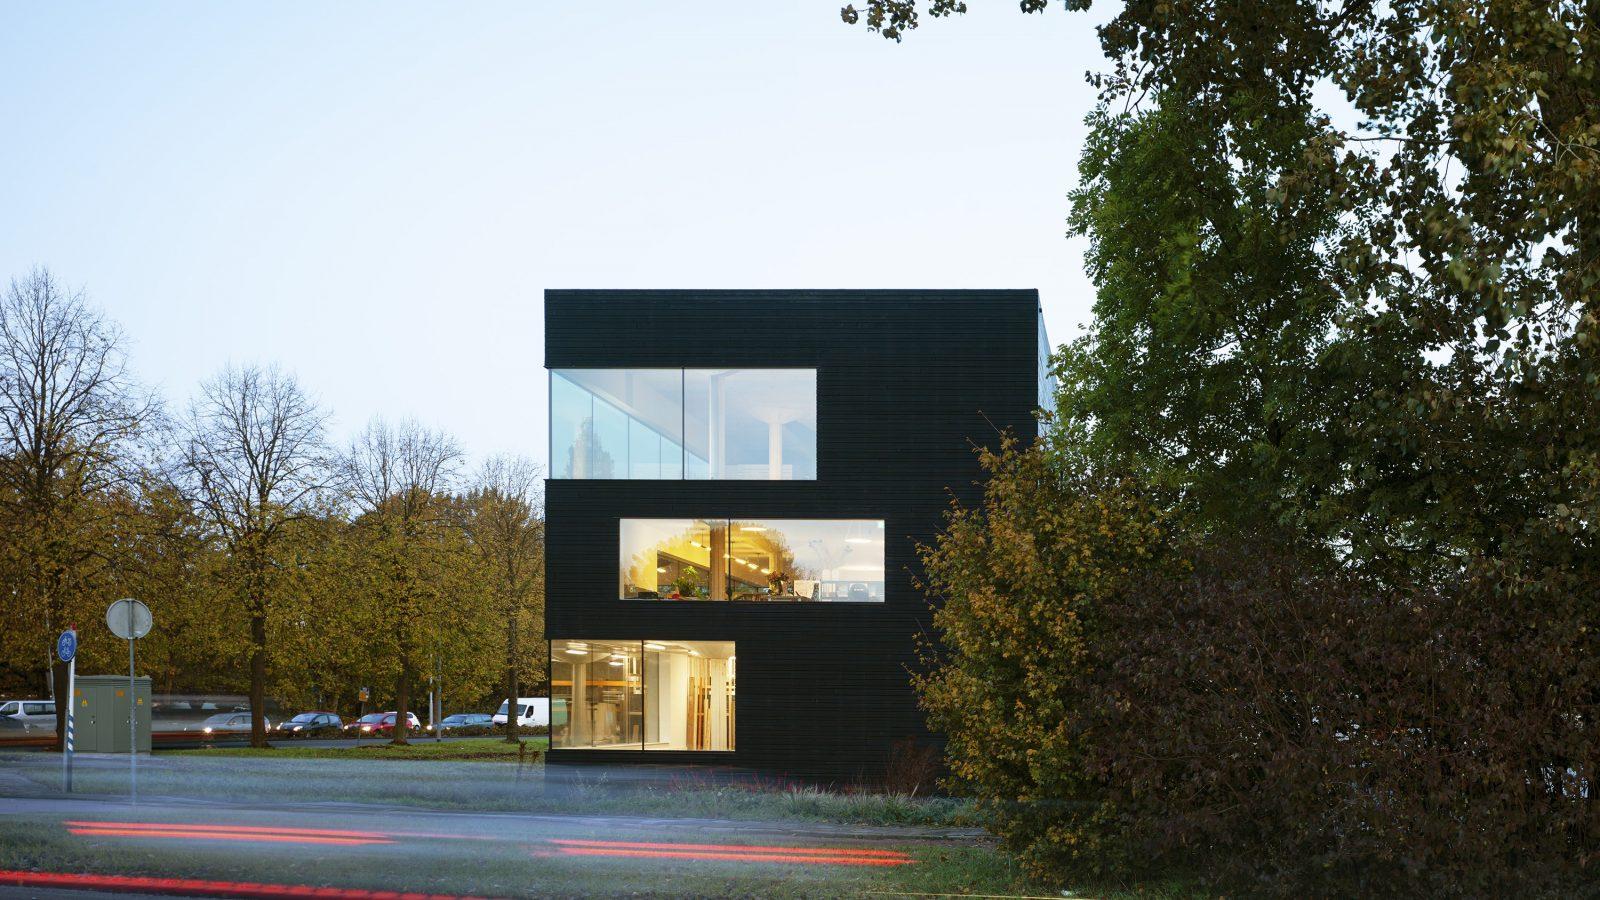 Loer Architecten Terbregsehof 11 foto 1 3000